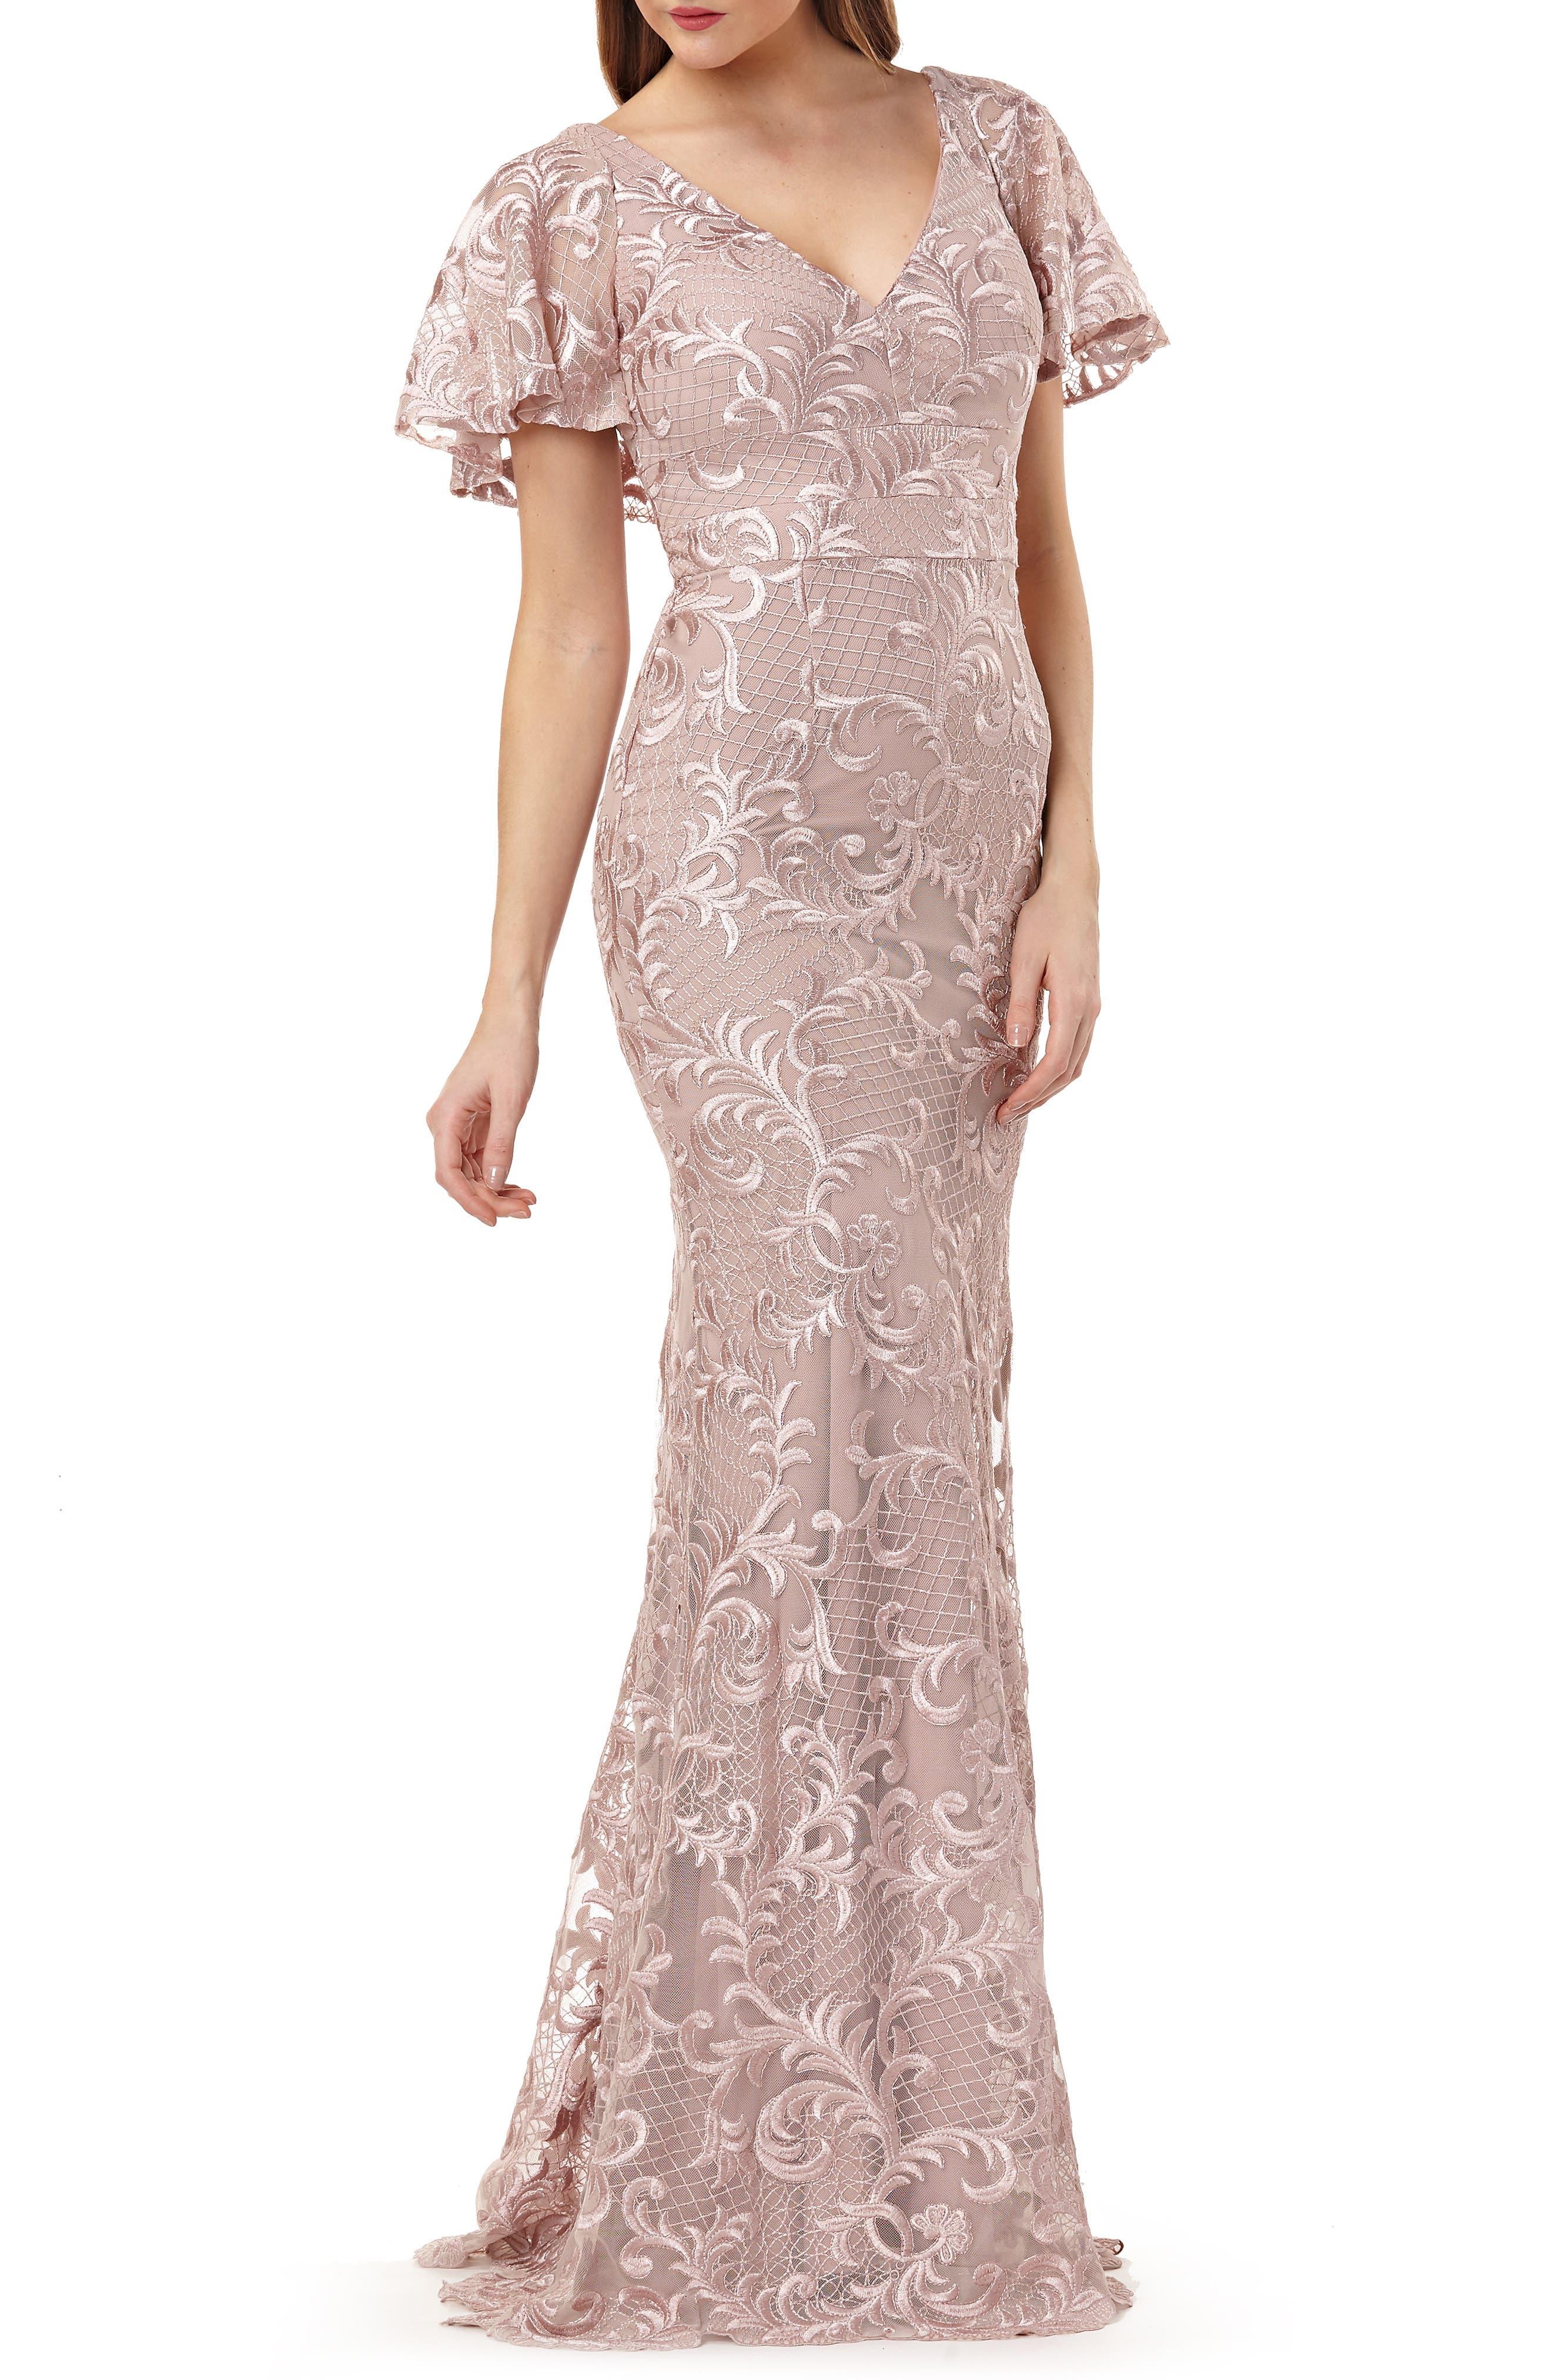 Vintage Evening Dresses and Formal Evening Gowns Womens Carmen Marc Valvo Infusion Capelet Sleeve Evening Dress Size 16 - Pink $448.00 AT vintagedancer.com